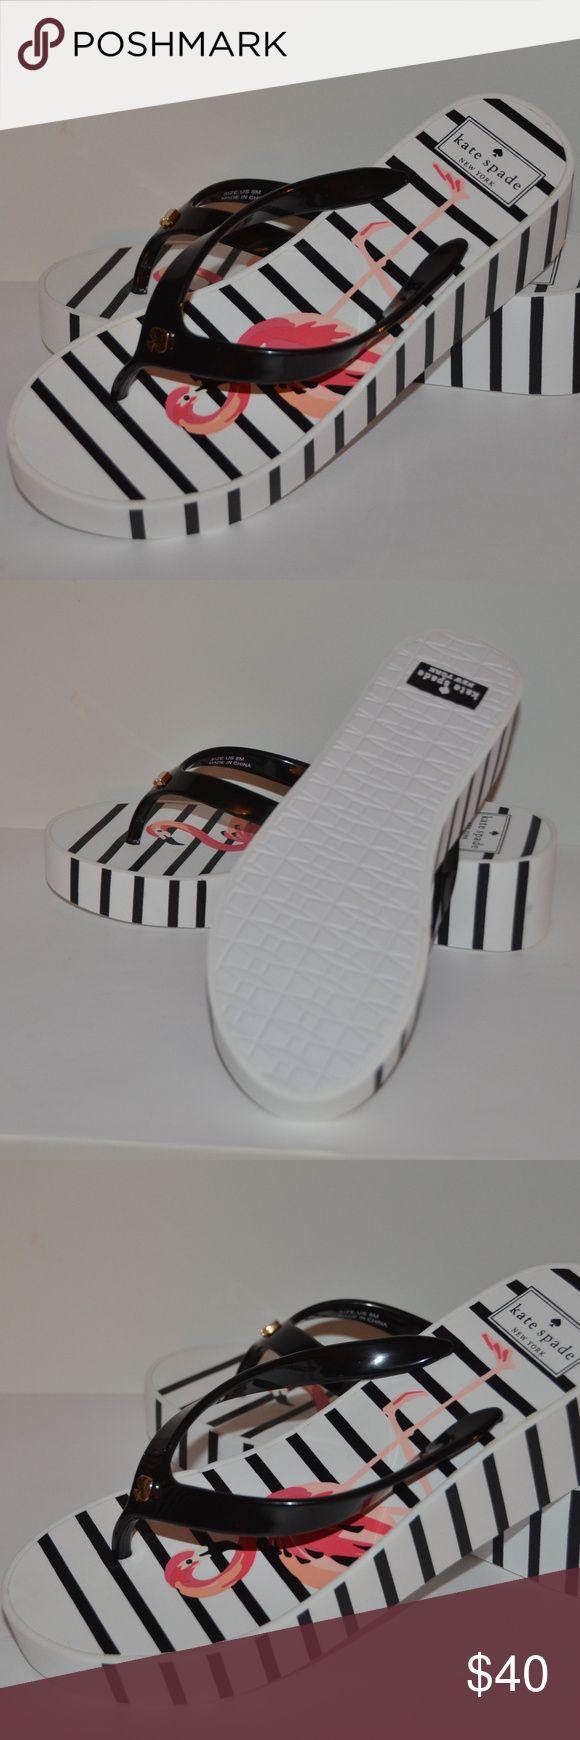 KATE SPADE FLAMINGO PLATFORM FLIP FLOPS SIZE 8 KATE SPADE FLAMINGO PLATFORM FLIP FLOPS SIZE 8 NEW WILL BE SHIPPED IN PRIORITY BOX, NOT IN ORIGINAL BOX kate spade Shoes Sandals